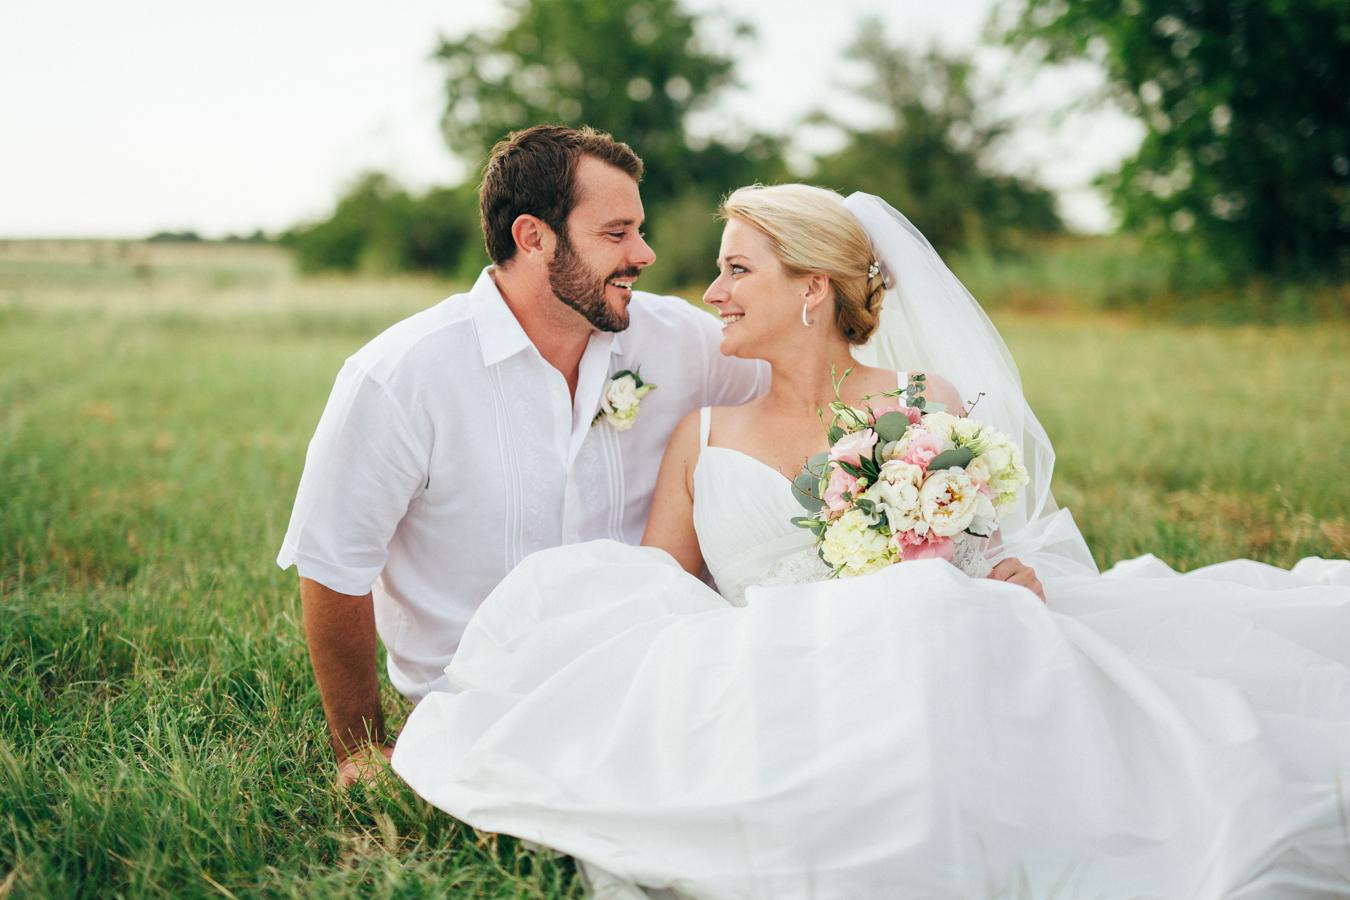 bridalportraits-cbarronjr-5225.jpg